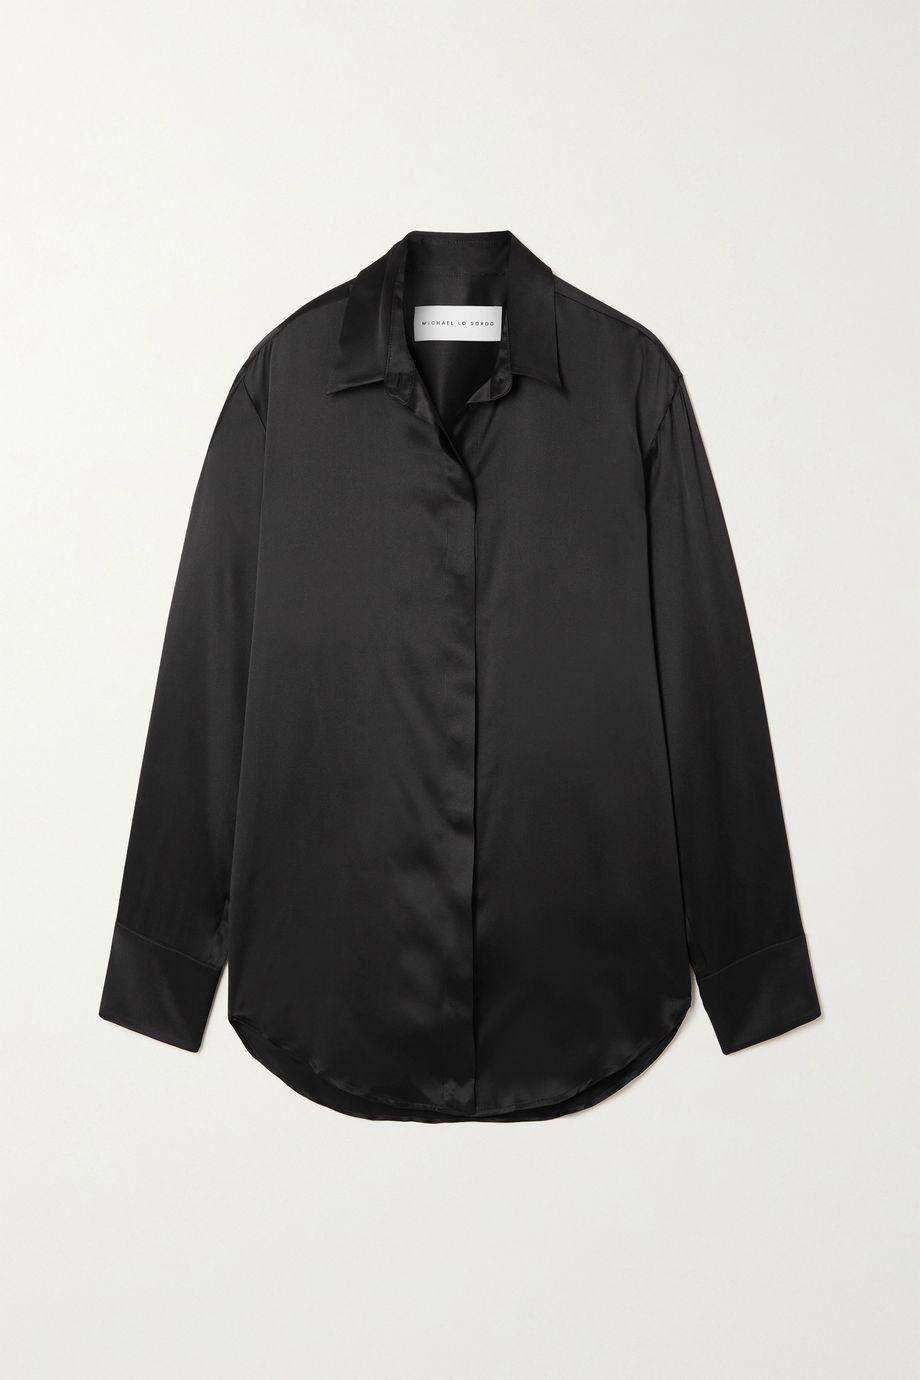 Michael Lo Sordo Boy silk-satin shirt